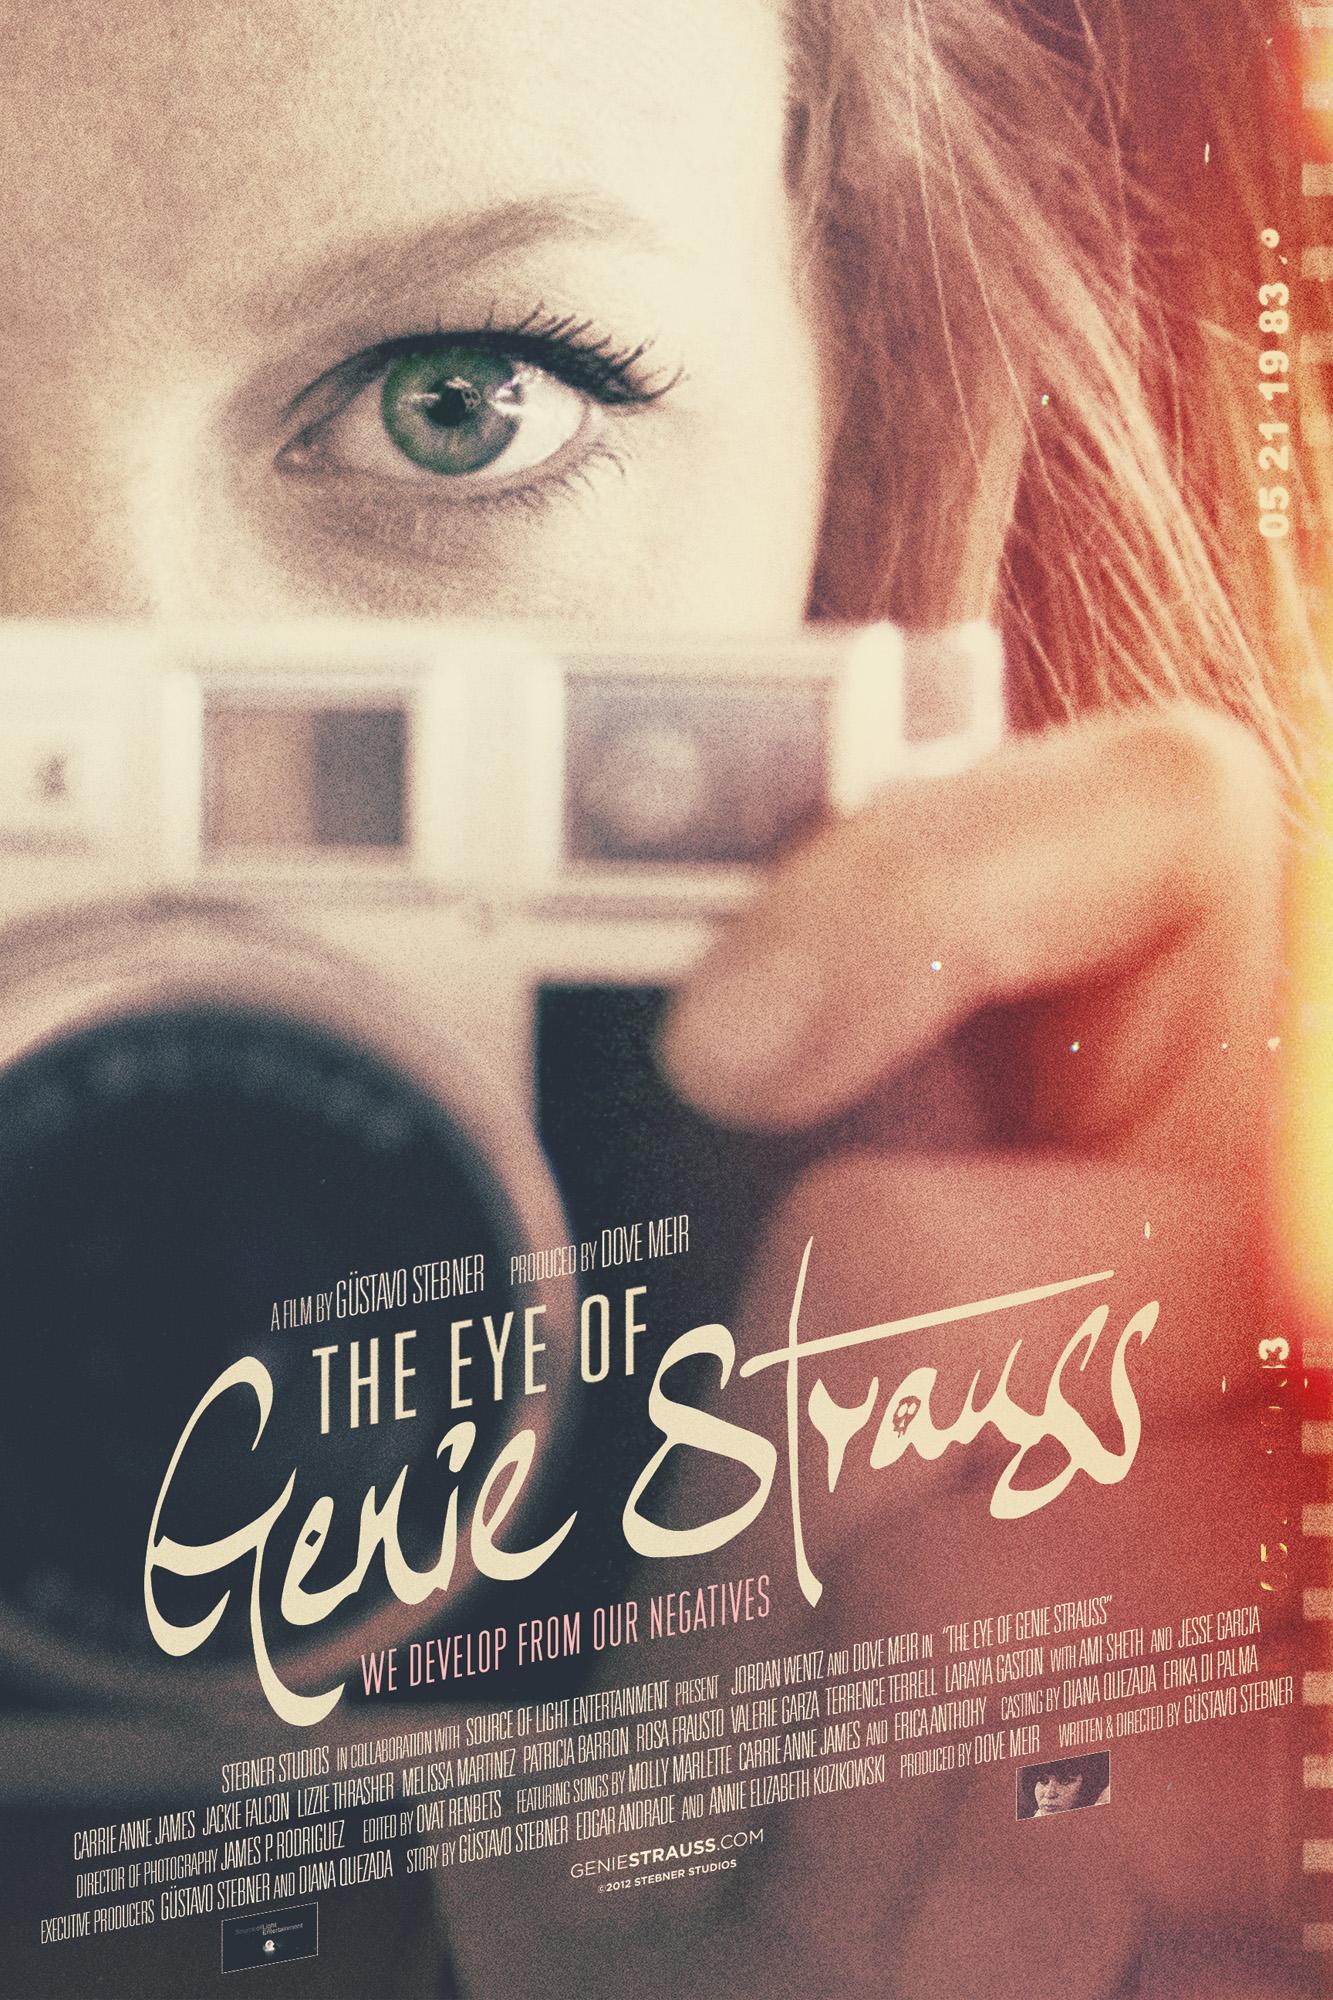 The Eye of Genie Strauss Film Poster